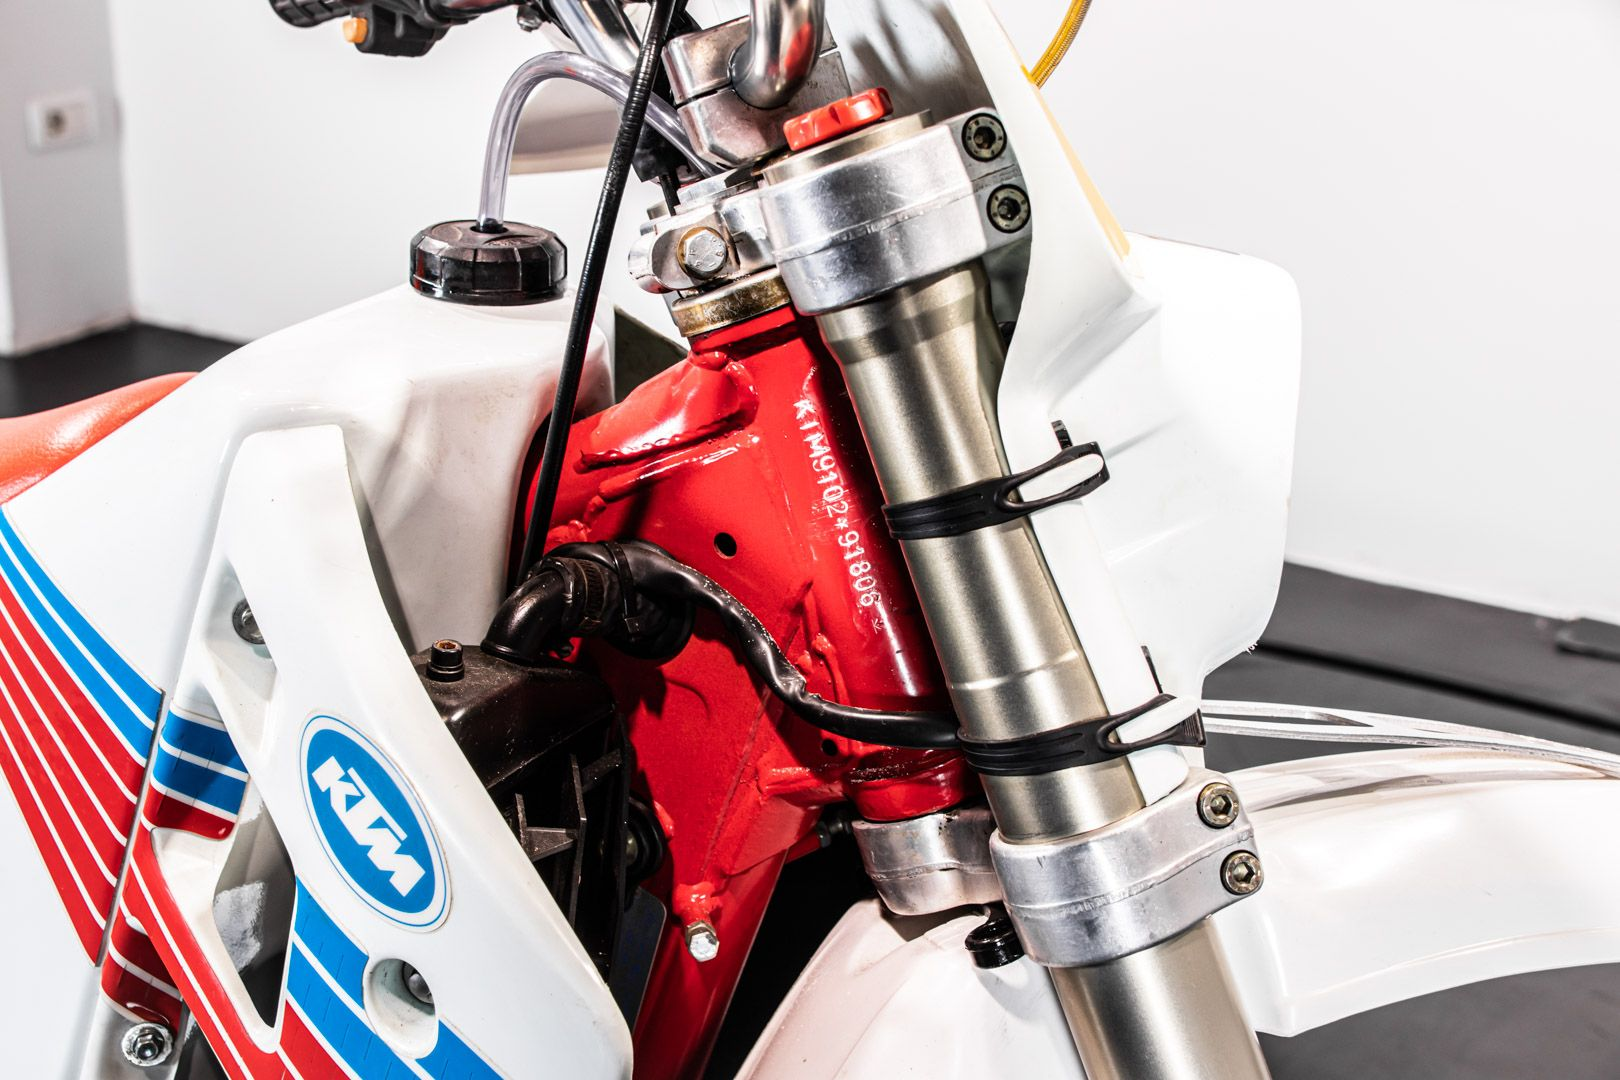 1991 KTM GS 250 82504